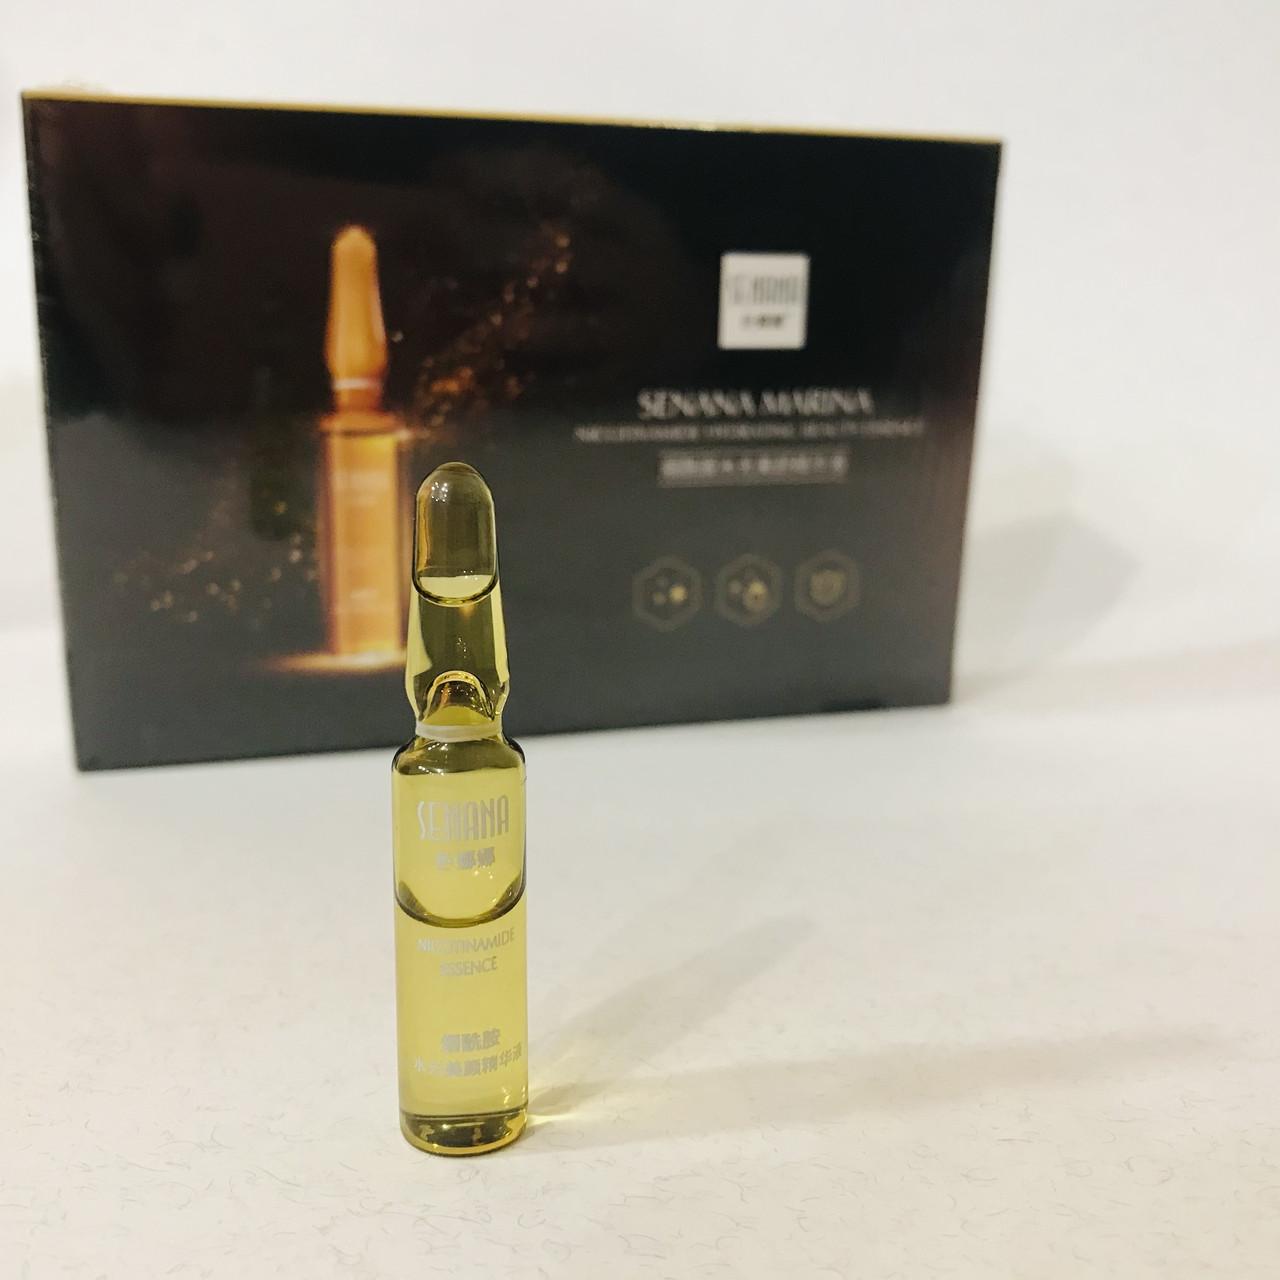 Восстанавливающий концентрат с никотинамидом Senana Marina Nicotinamide, 2мл